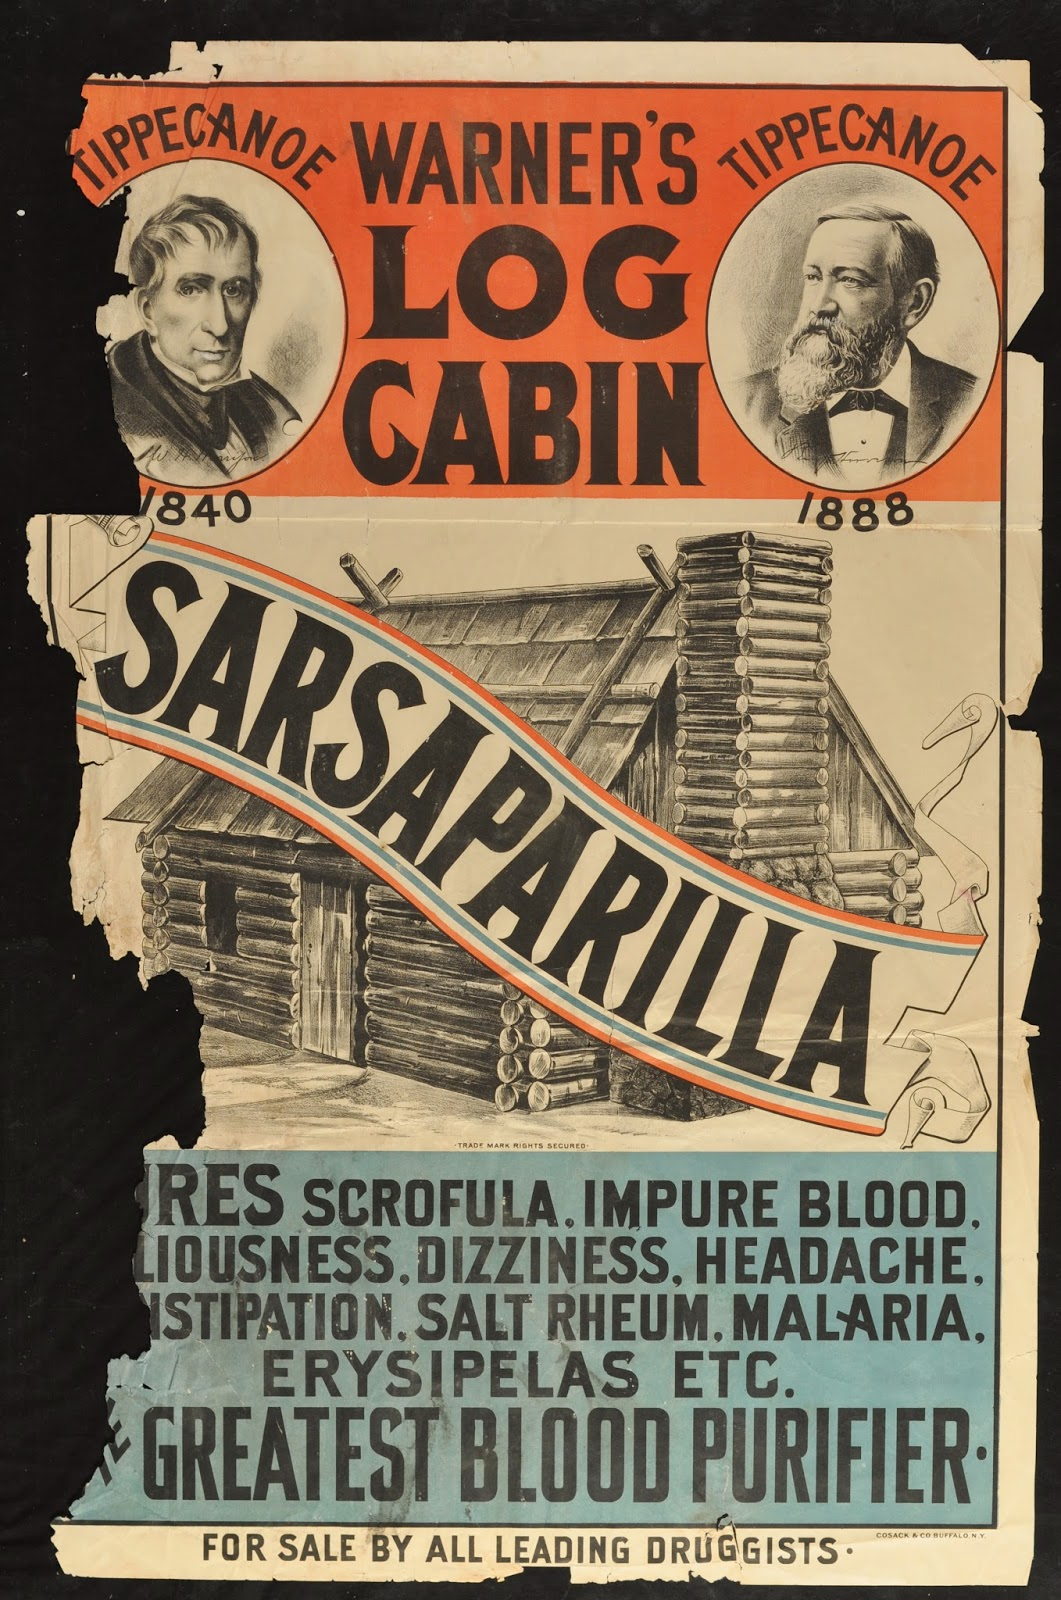 Poster Mountain: How Do You Pronounce Sarsaparilla? - photo#36